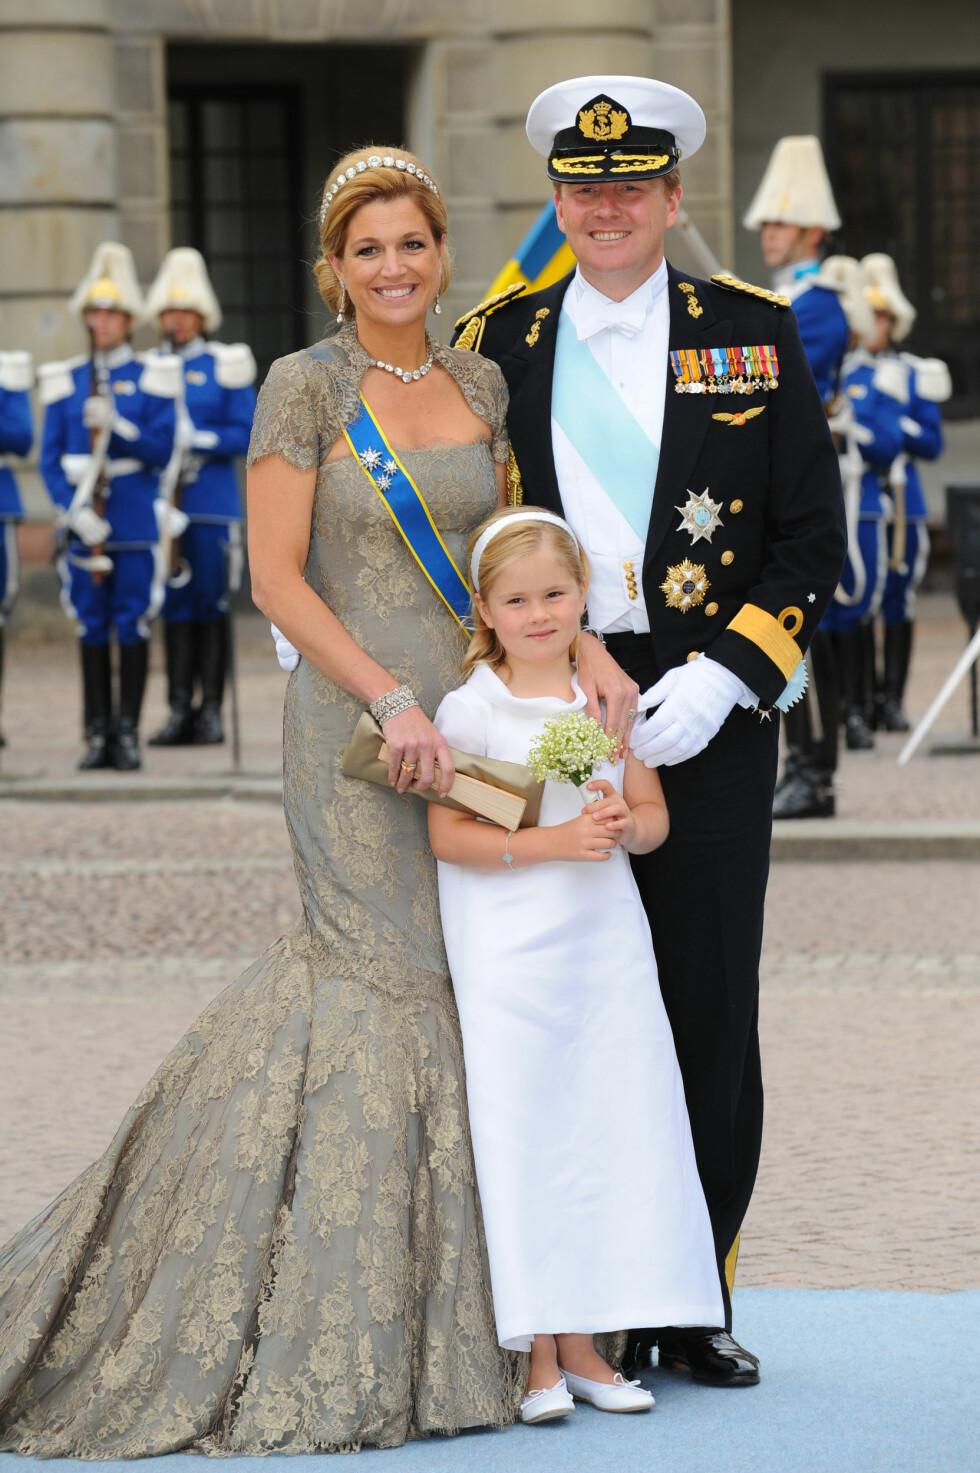 KOMMENDE DRONNING: Kronprinsesse Catharina-Amalia (12) av Nederland skal en dag ta over tronen etter mamma dronning Maxima og pappa kong Willem-Alexander. Hun var brudepike da kronprinsesse Victoria giftet seg med Daniel Westling i Sverige sommeren 2010. Foto: NTB Scanpix